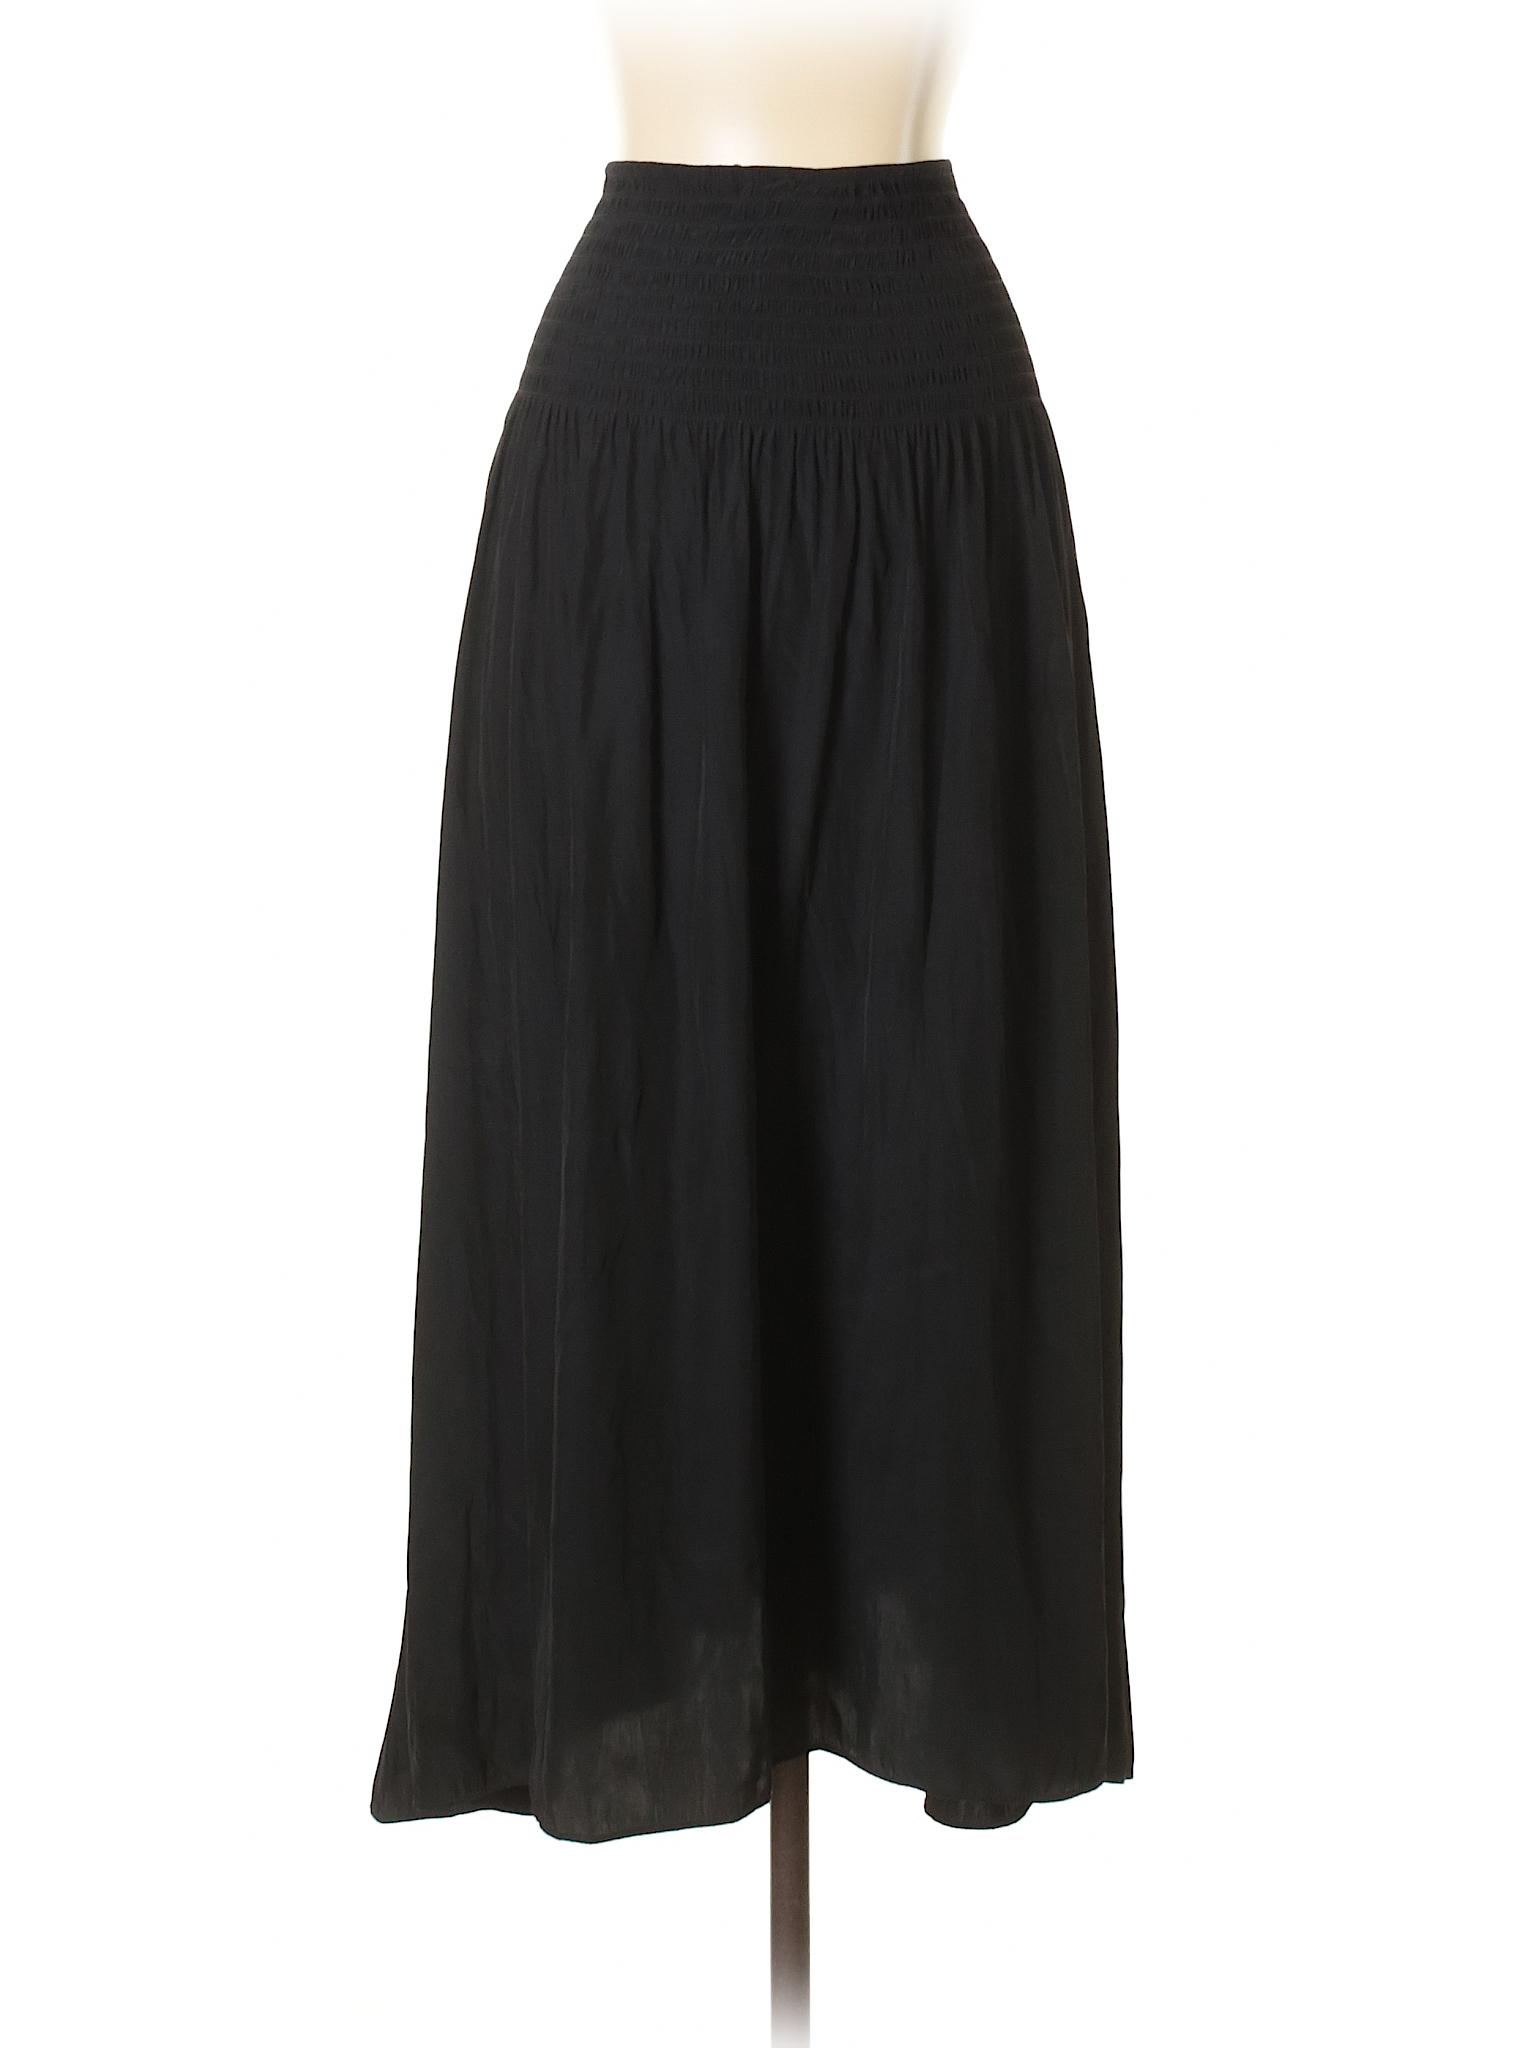 St winter Calypso Skirt Leisure Barth Casual zwxO0gPSSn